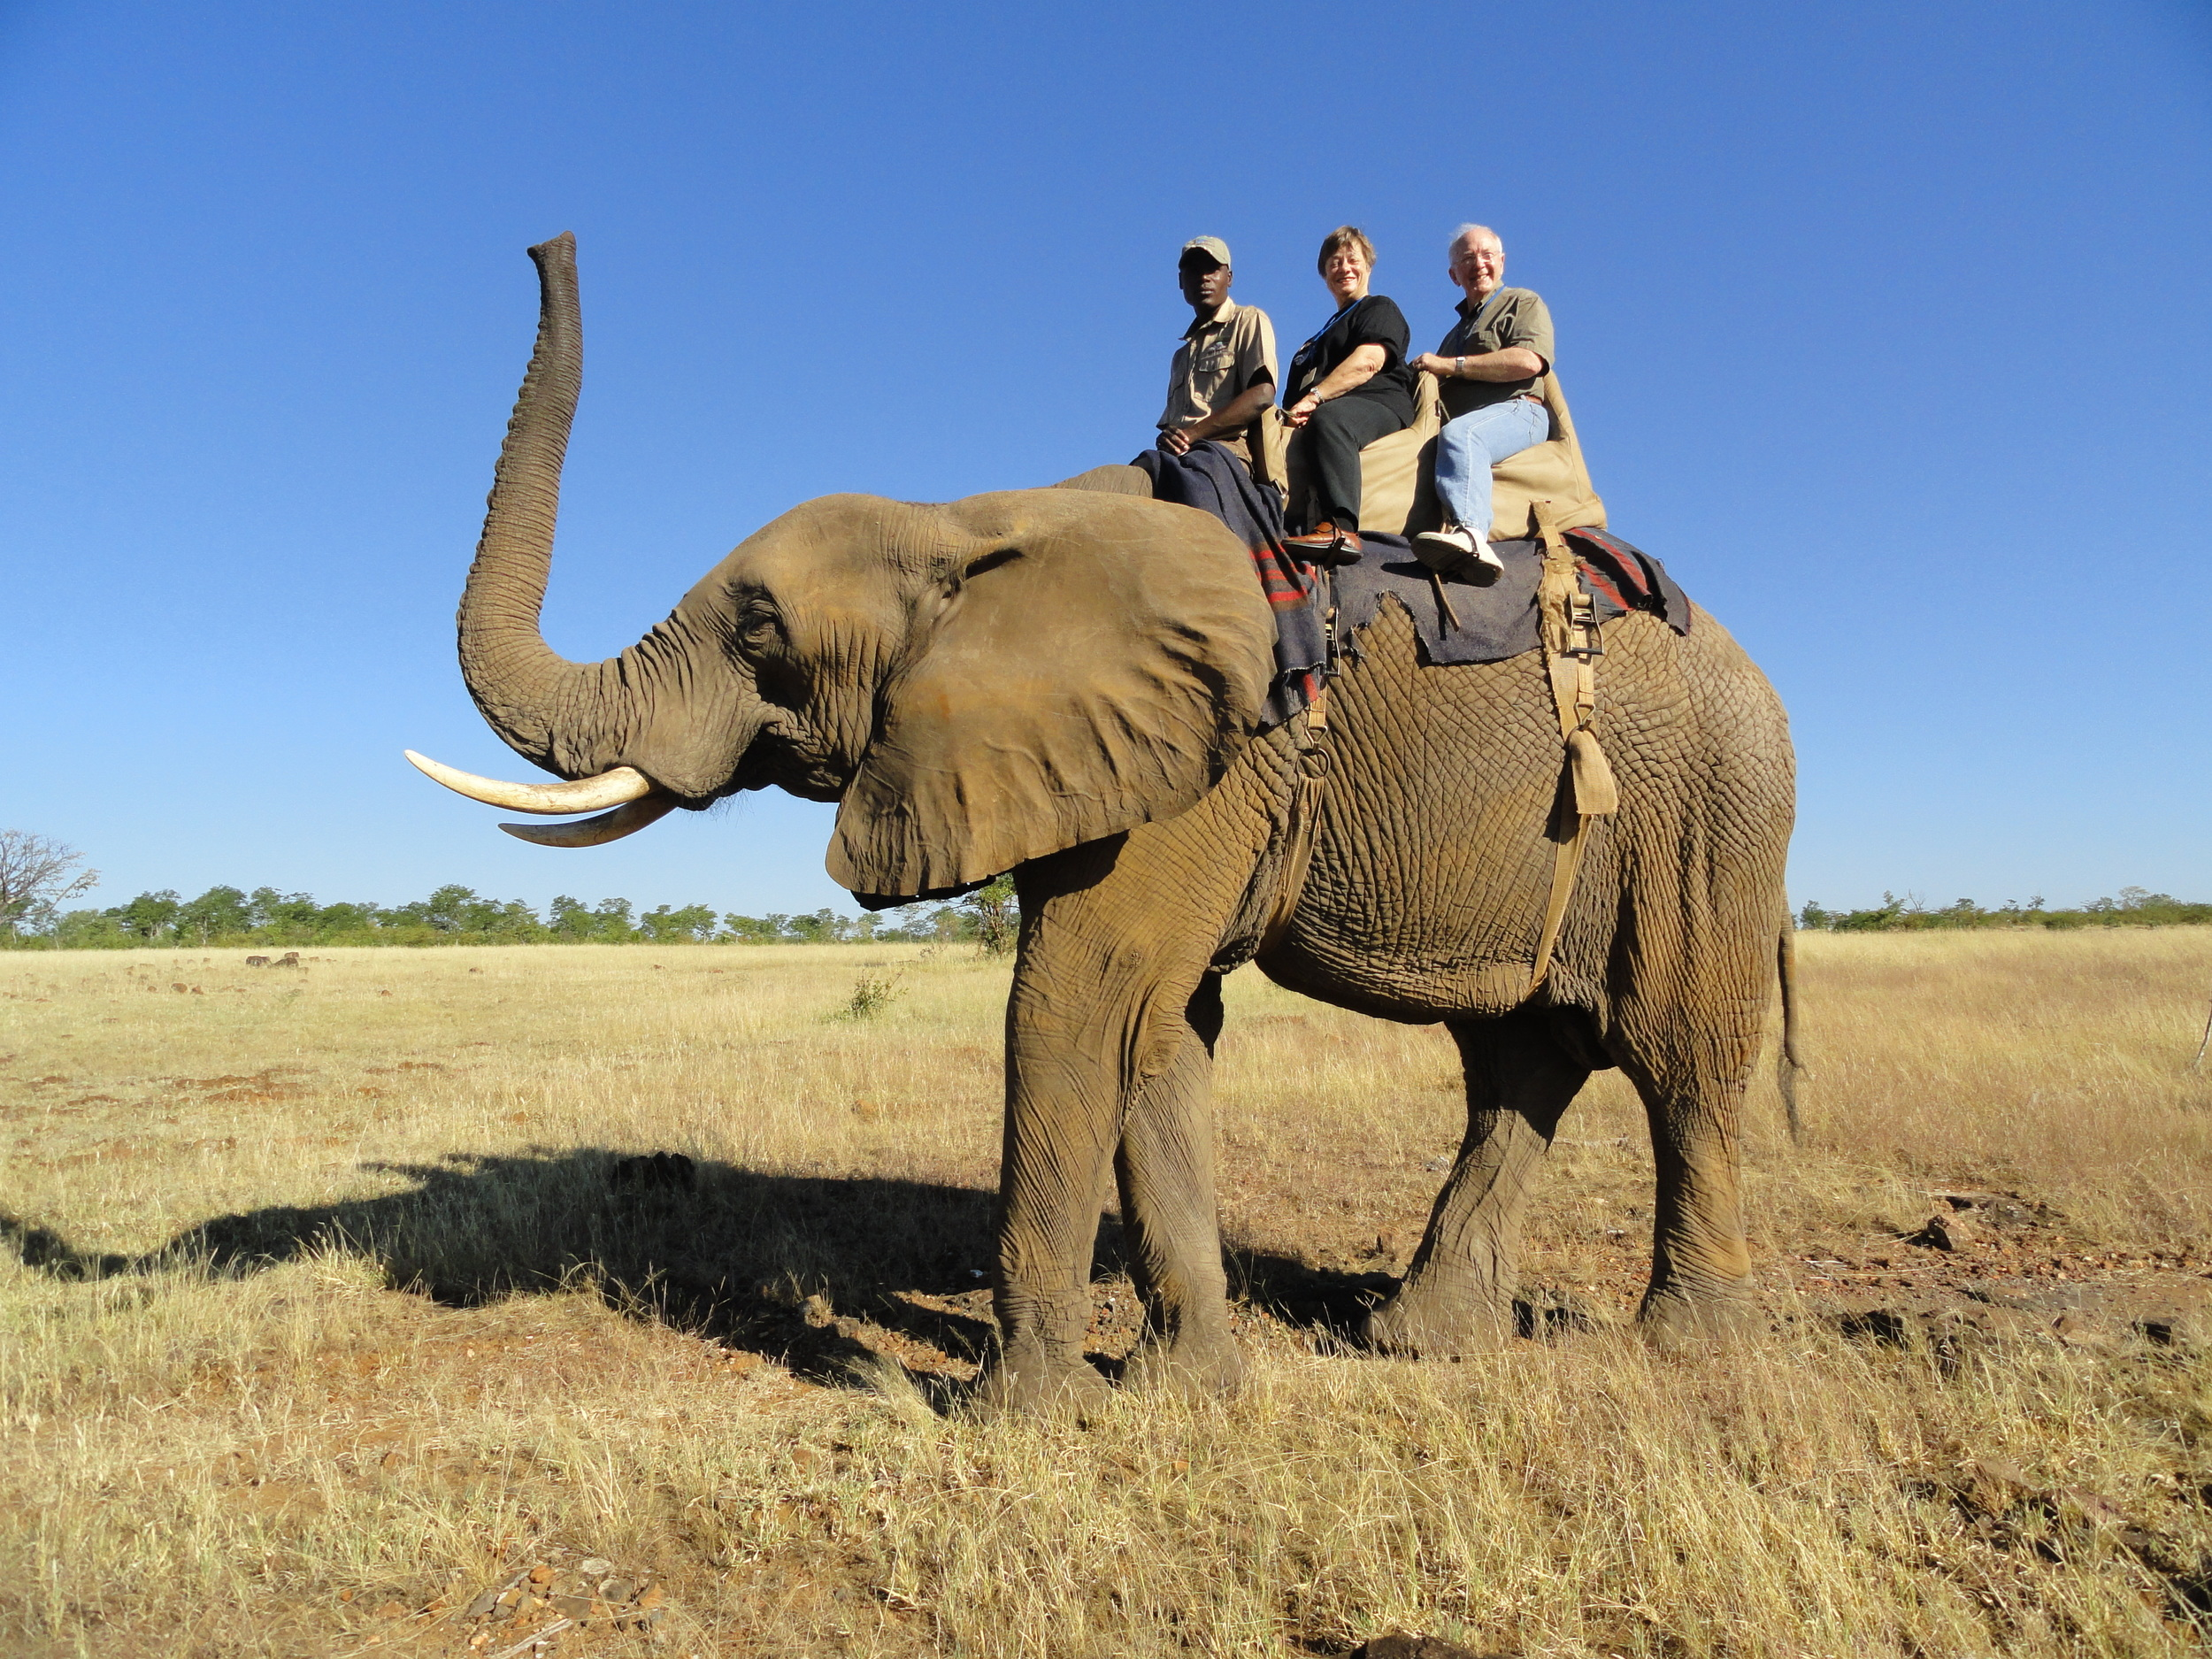 The Hammers riding an elephant on an African safari